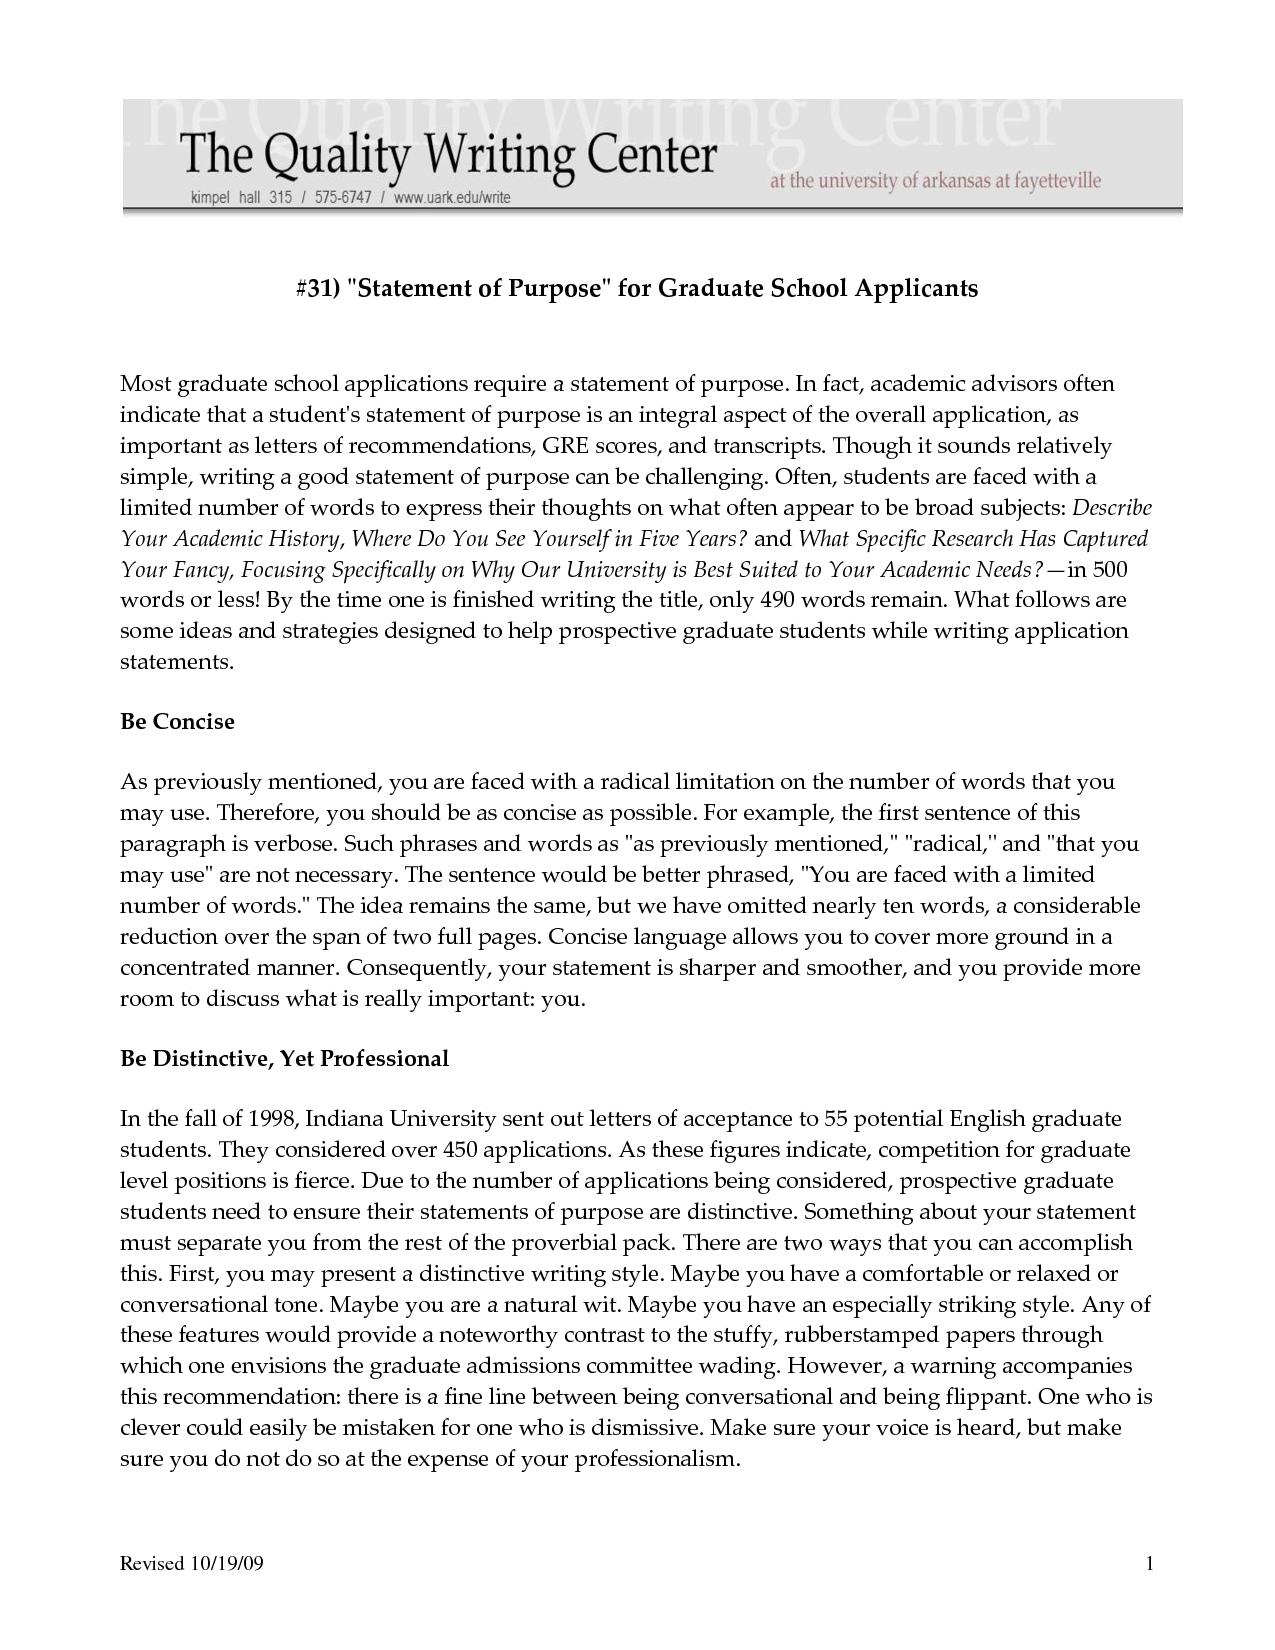 Statement Of Purpose For Grad School Sample – Bacguikwon30